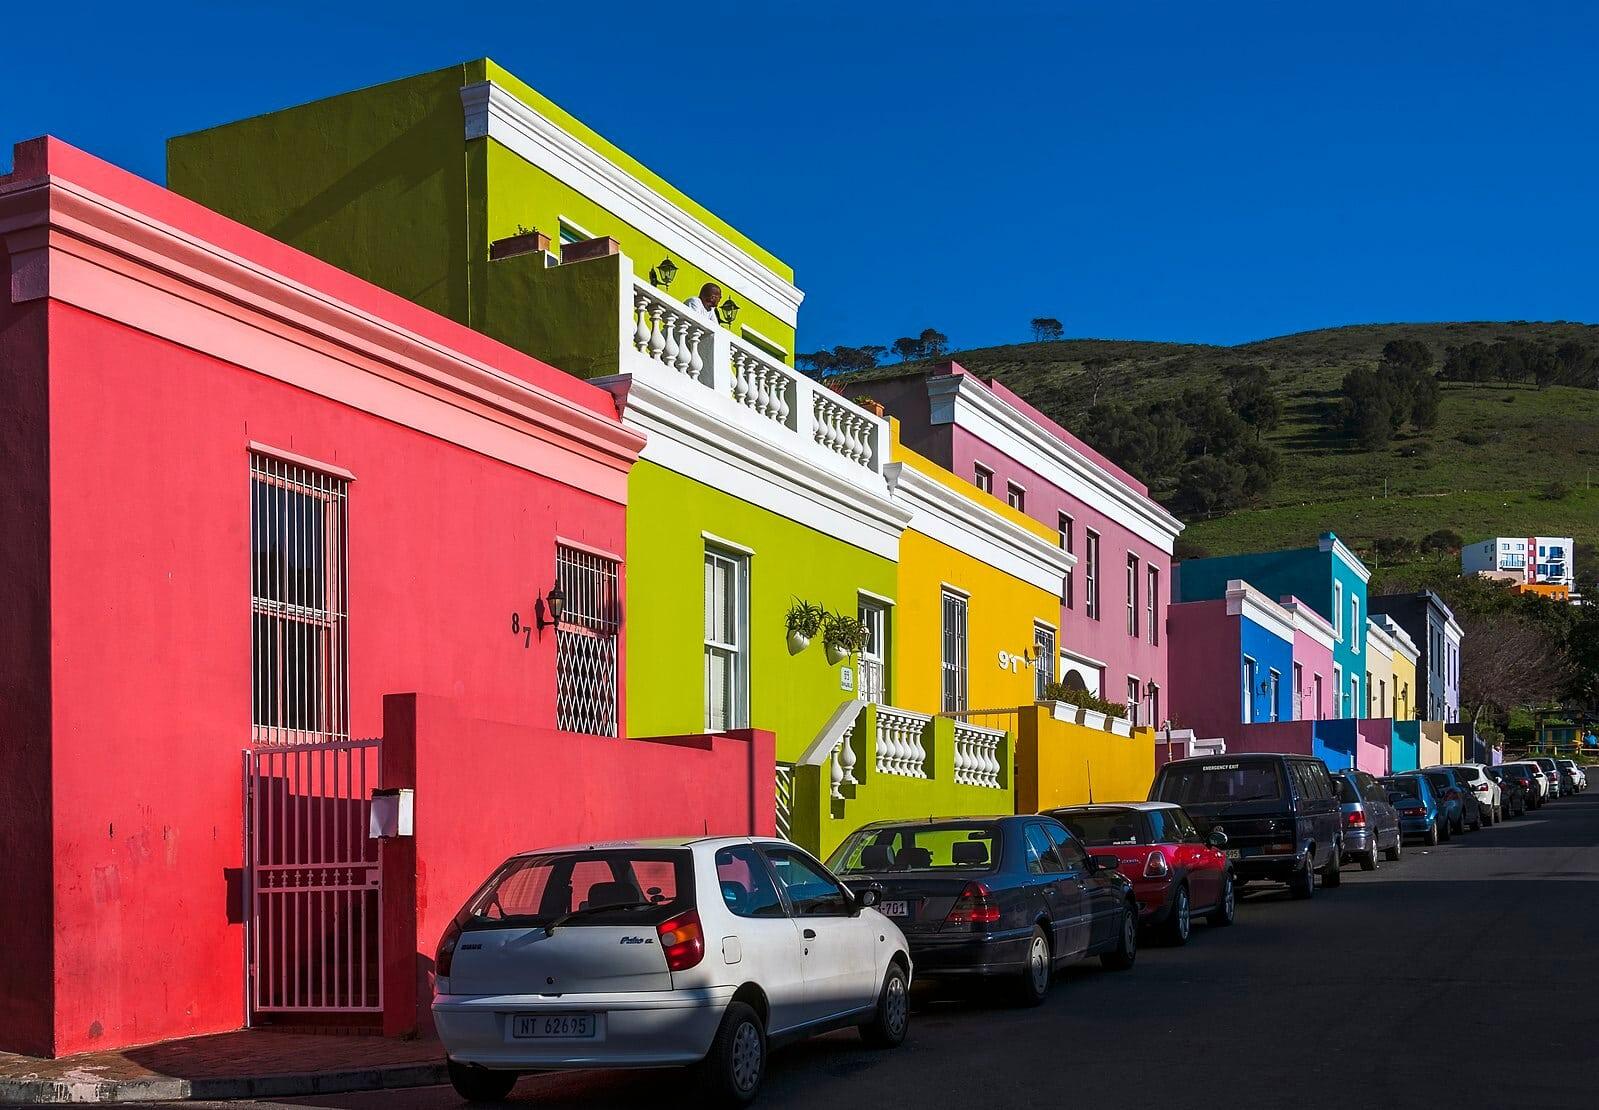 Landmarks in South Africa - Bo Kaap Cape Town